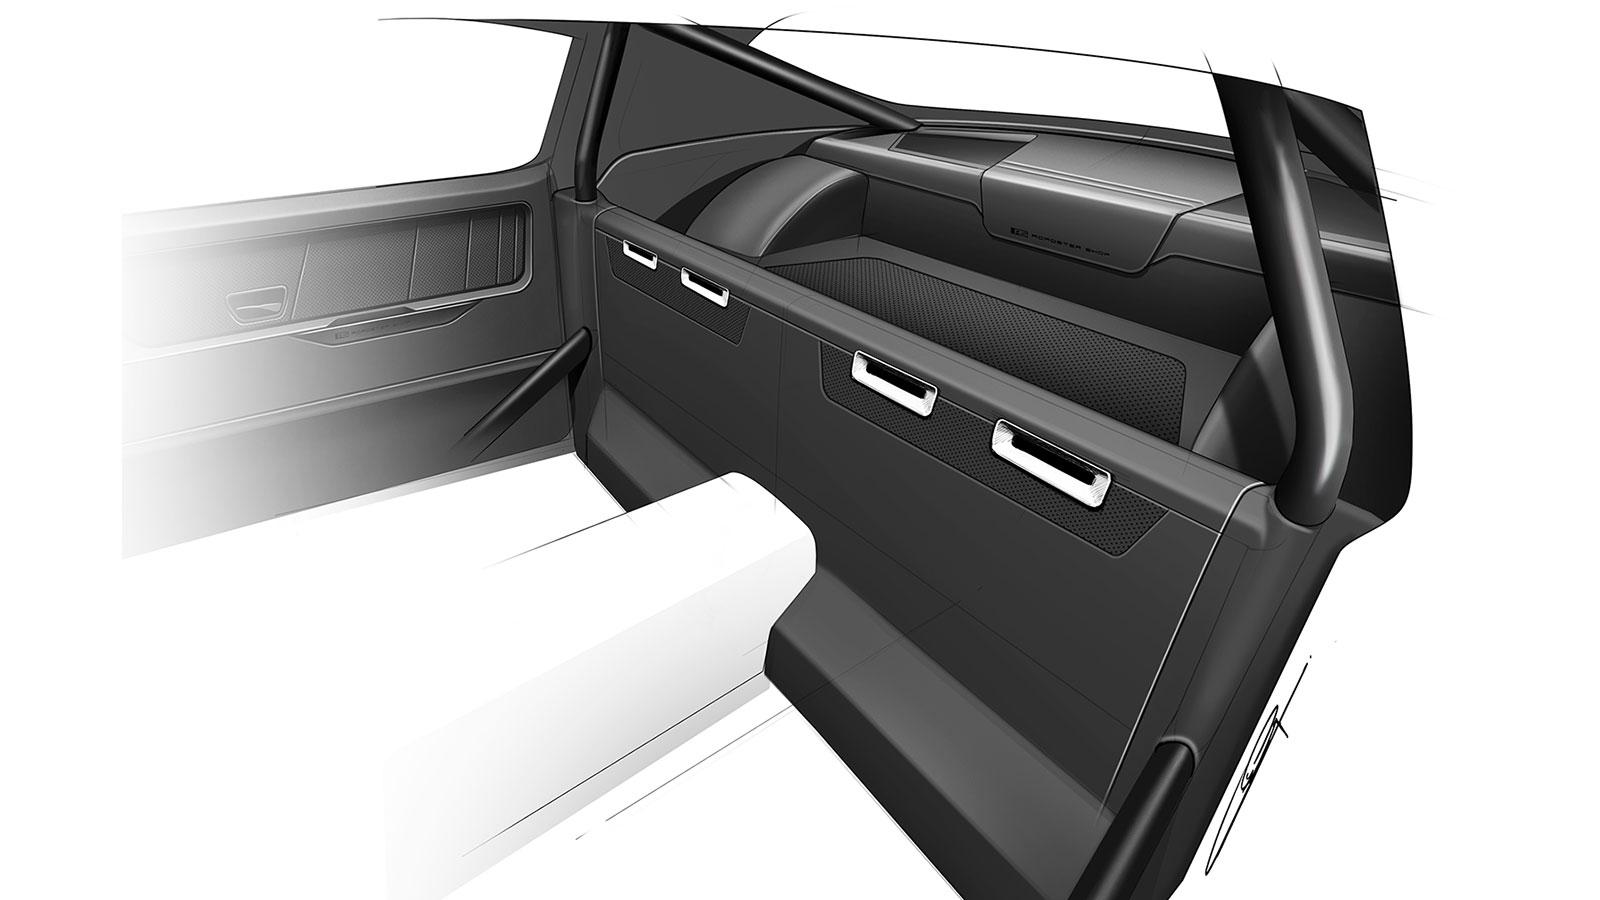 interior-custom-rear-area-concept